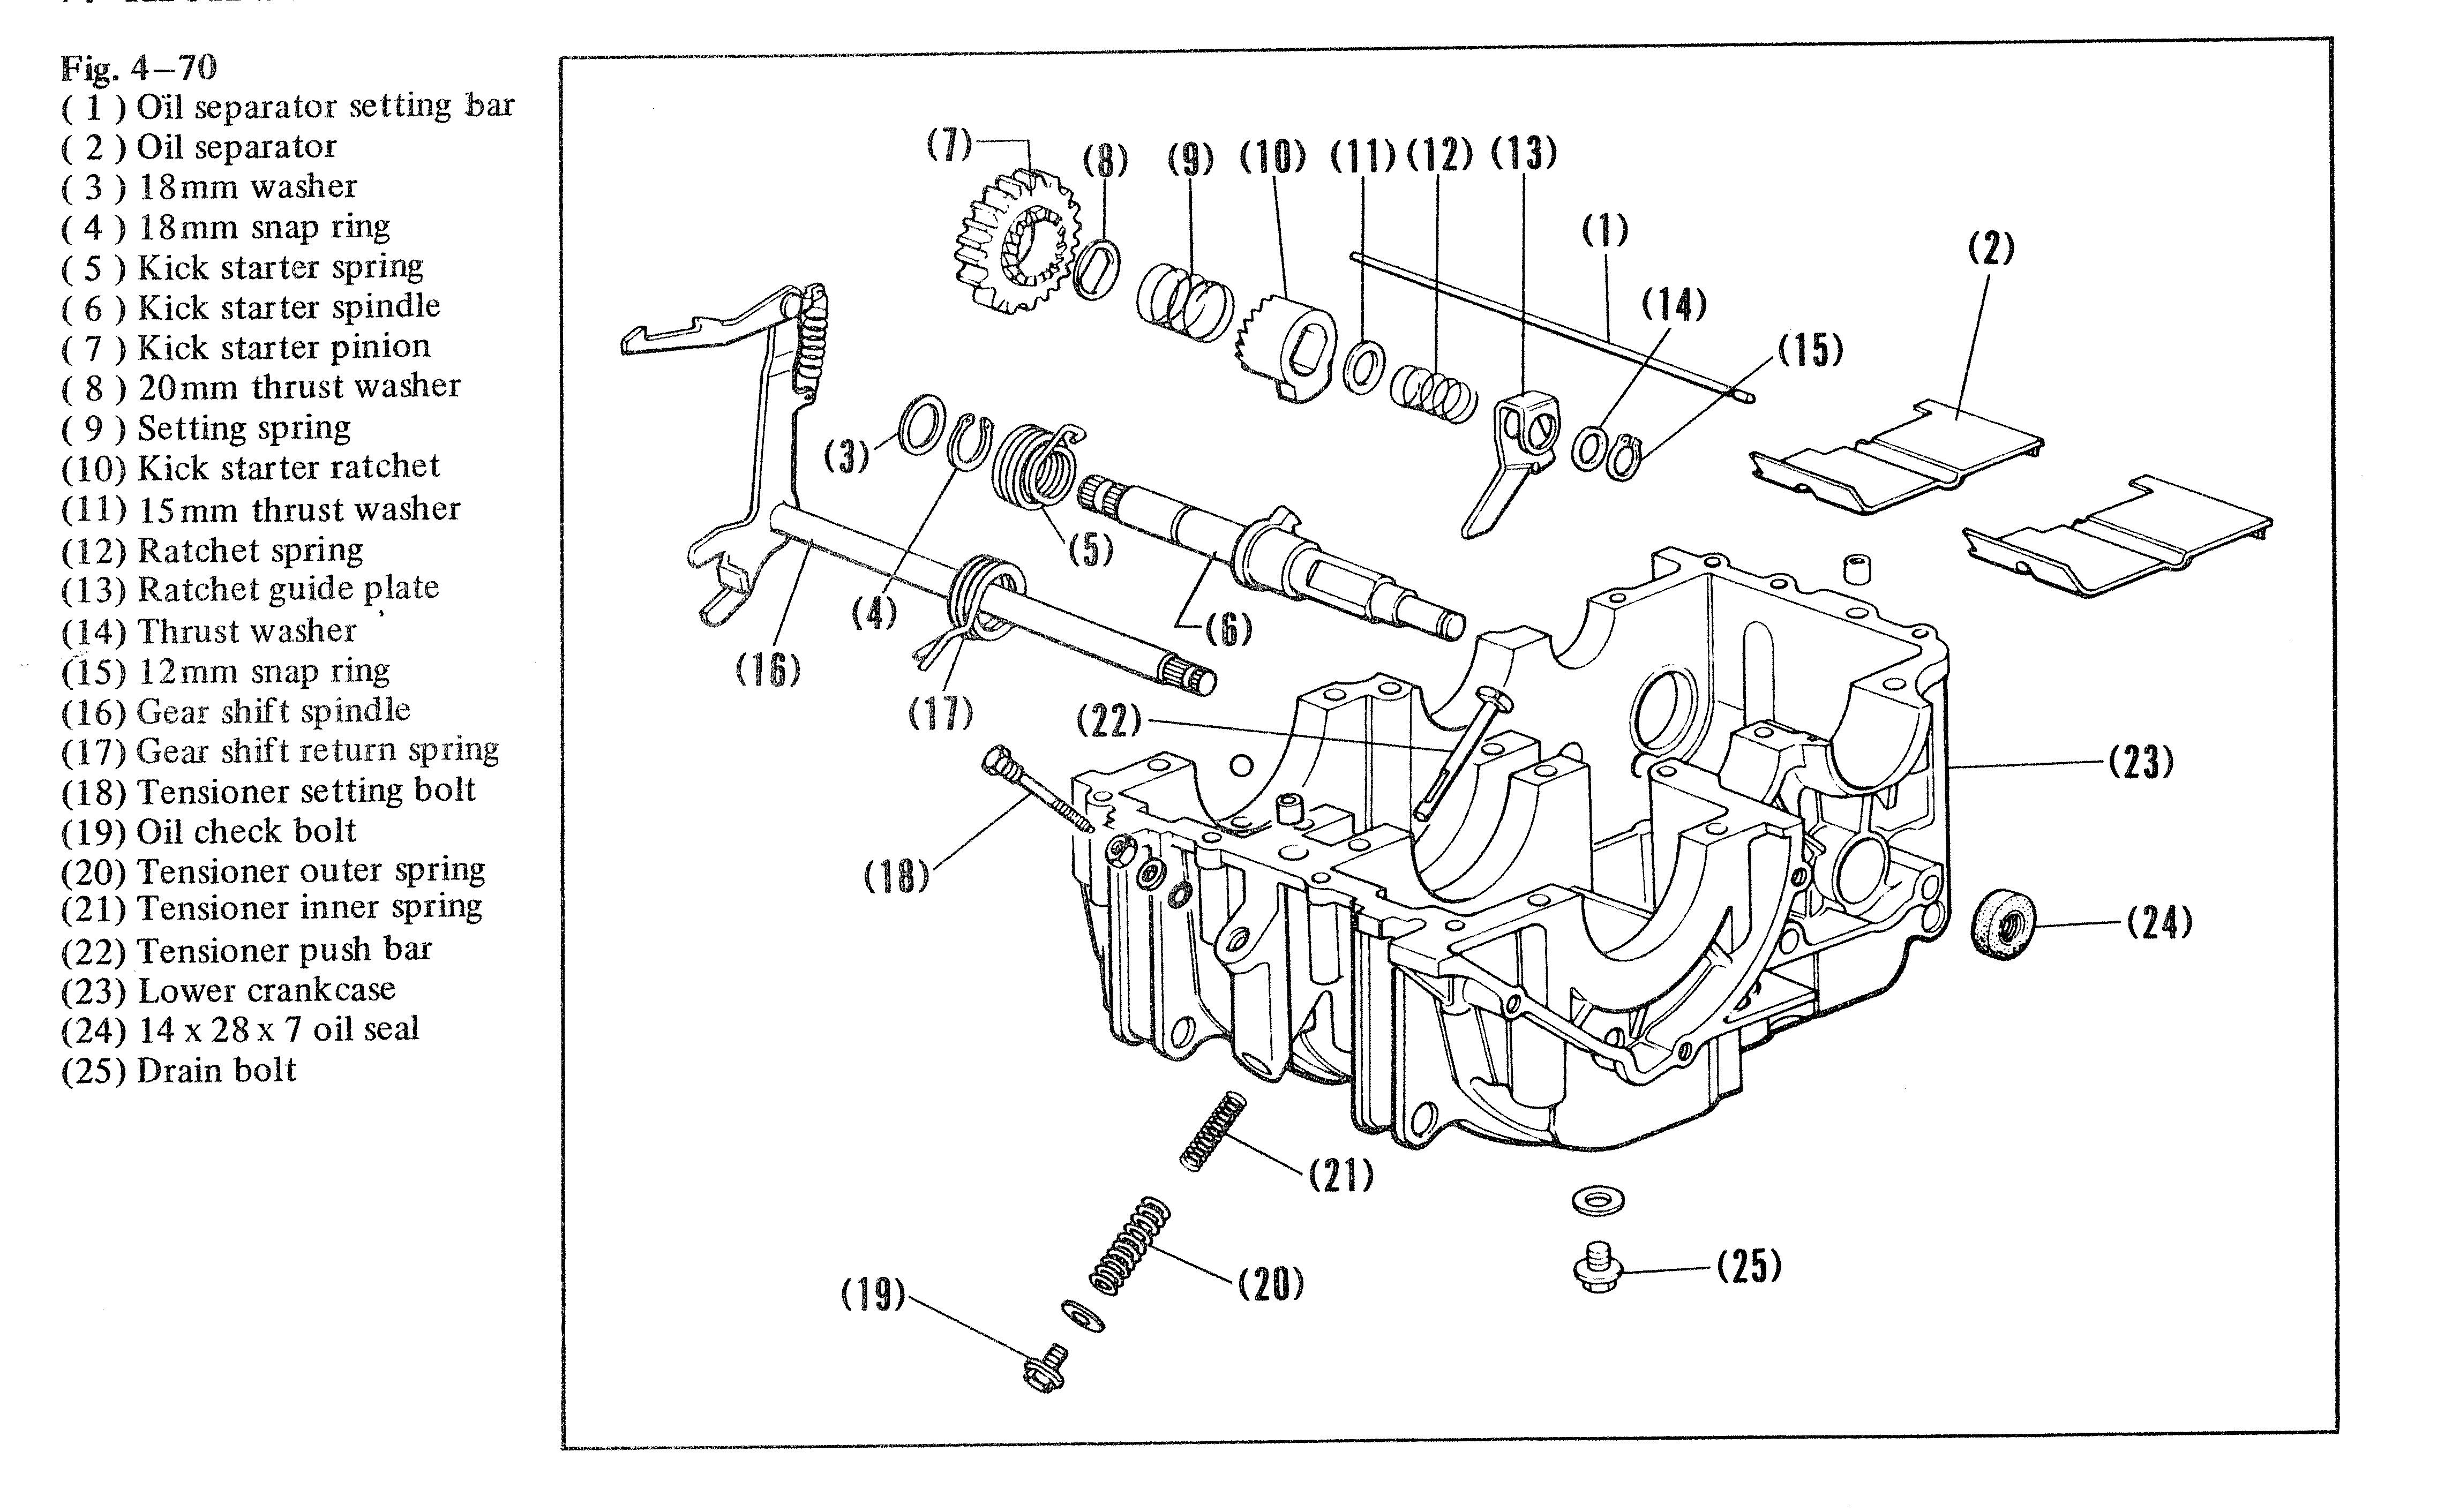 Cb360 Engine Diagram. honda cb360 sport 1974 usa frame schematic  partsfiche. 1975 cl360 motor parts needed. cb360 cam chain tensioner lower  bolt. cb360t oil starvation 2 broken oil pumps need new head.2002-acura-tl-radio.info